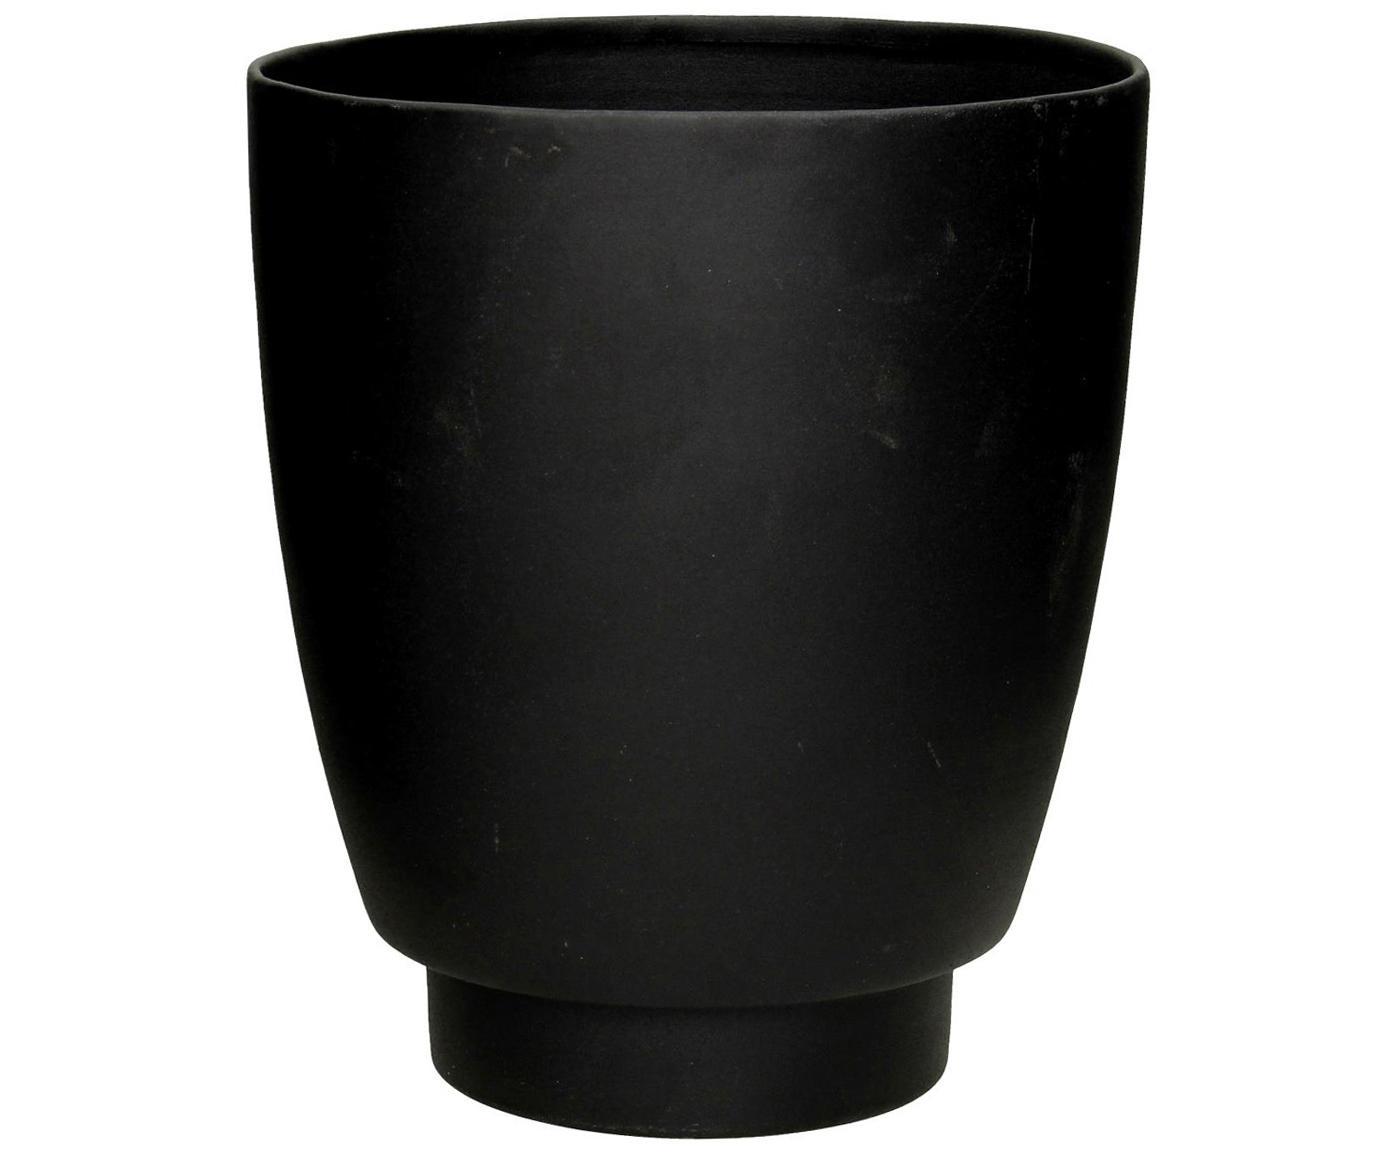 Komplet osłonek na doniczkę Timber, 2 elem., Metal powlekany, Czarny, Ø 21 x W 26 cm